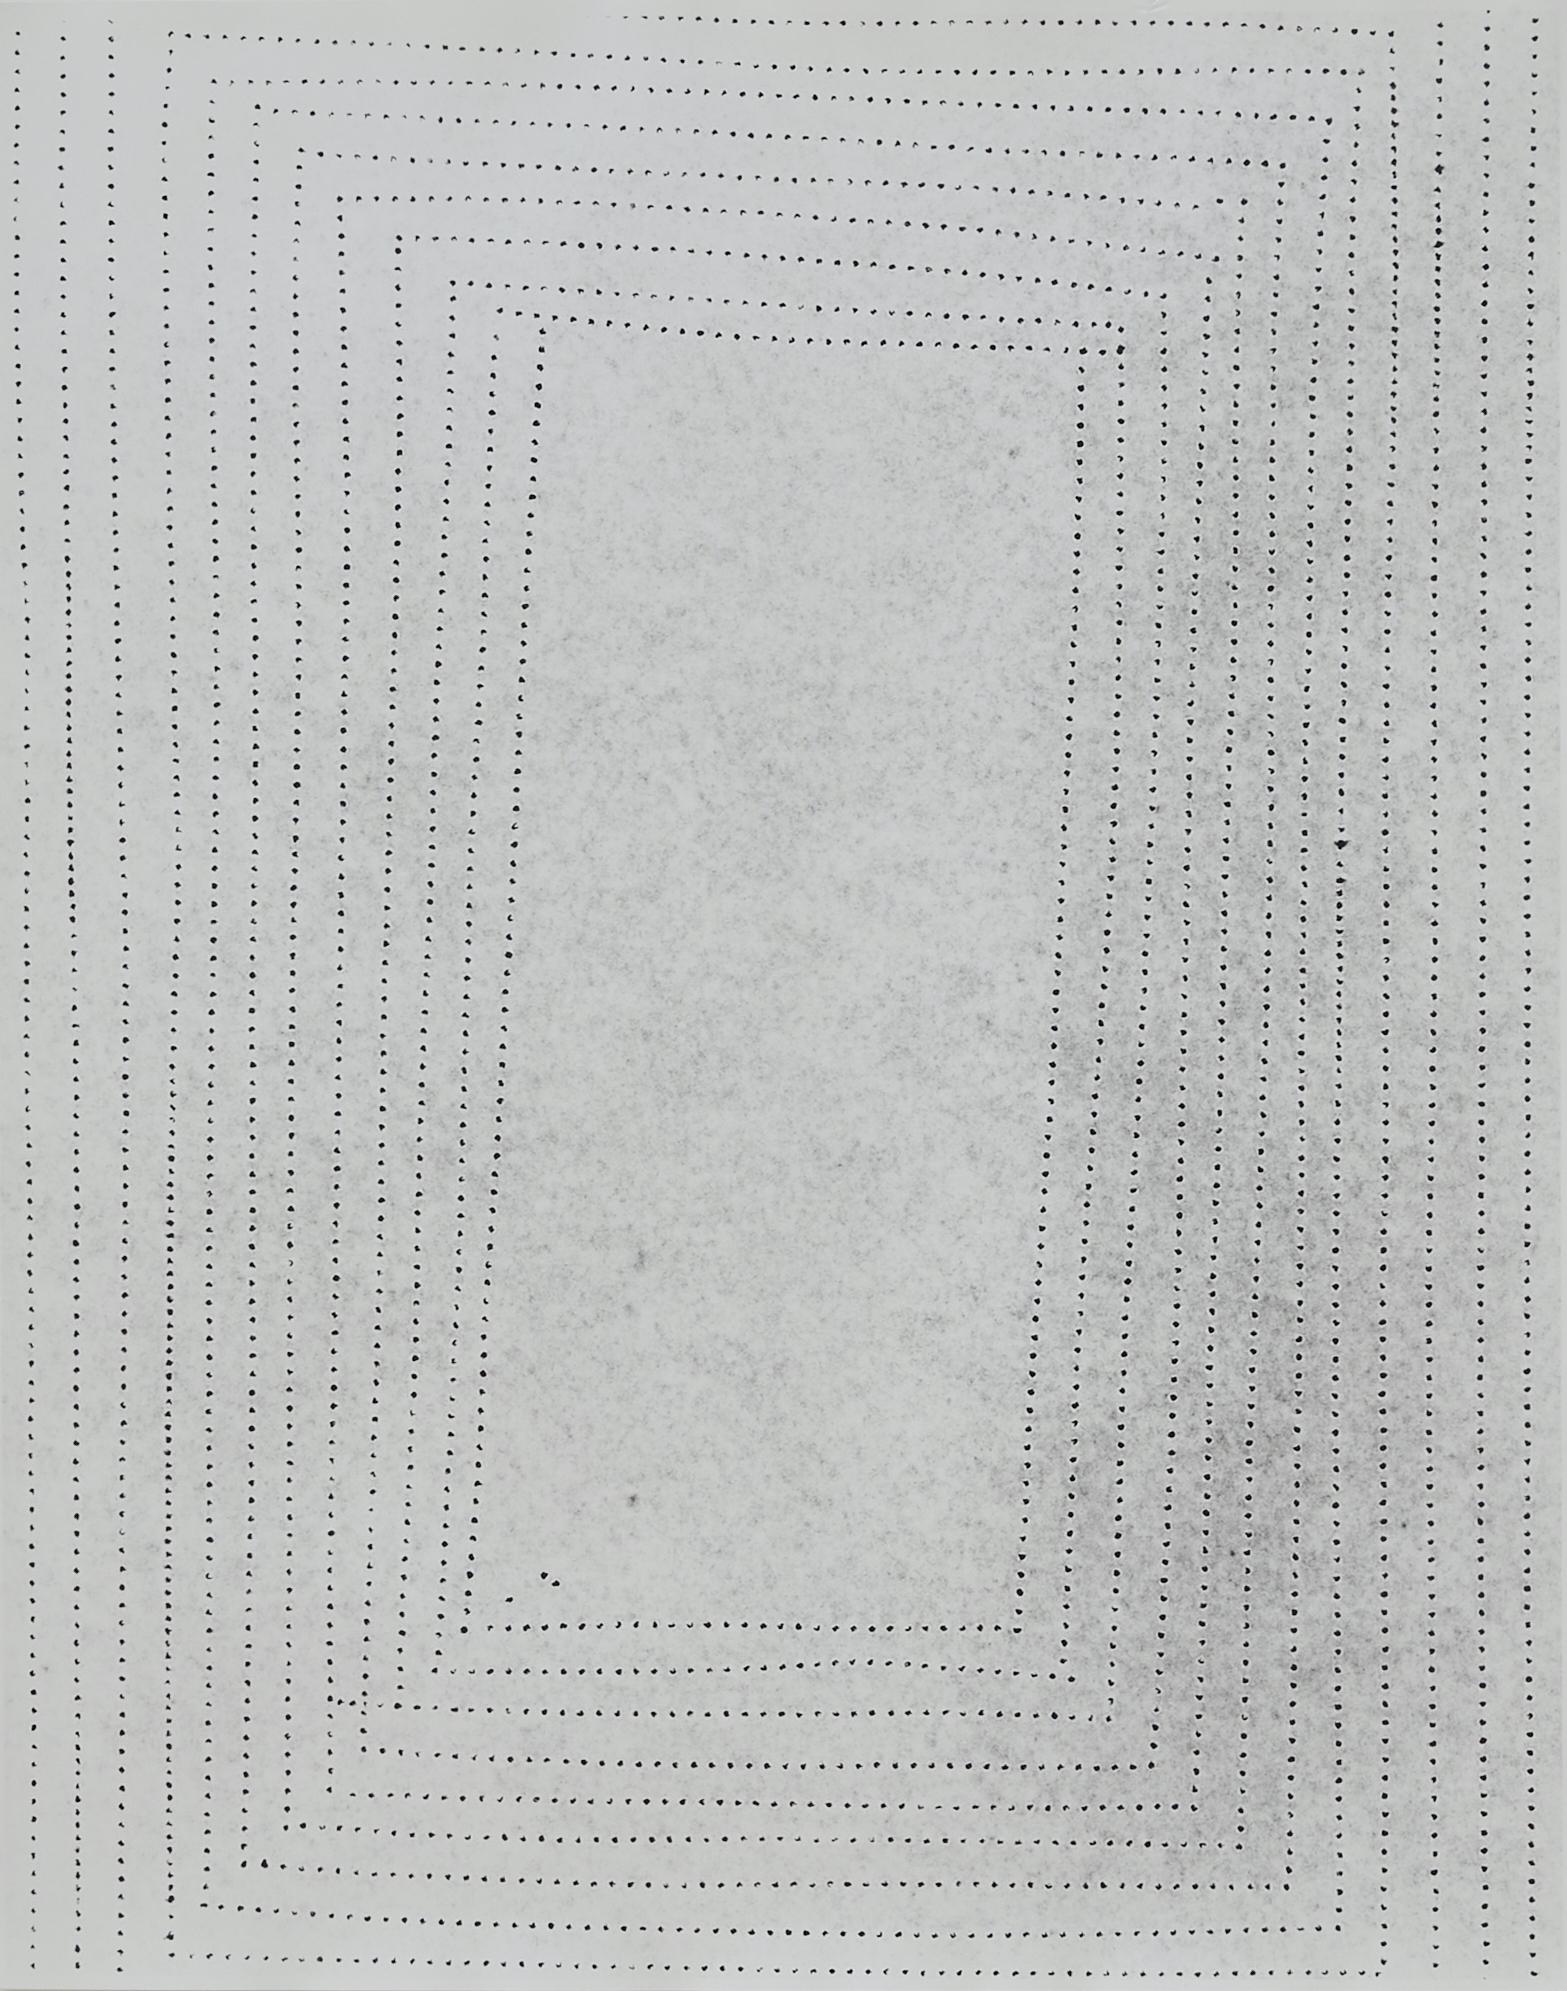 Practice Piece (Sewing Excerise #21W), 2019, Silver gelantin print, 53 x 40cm